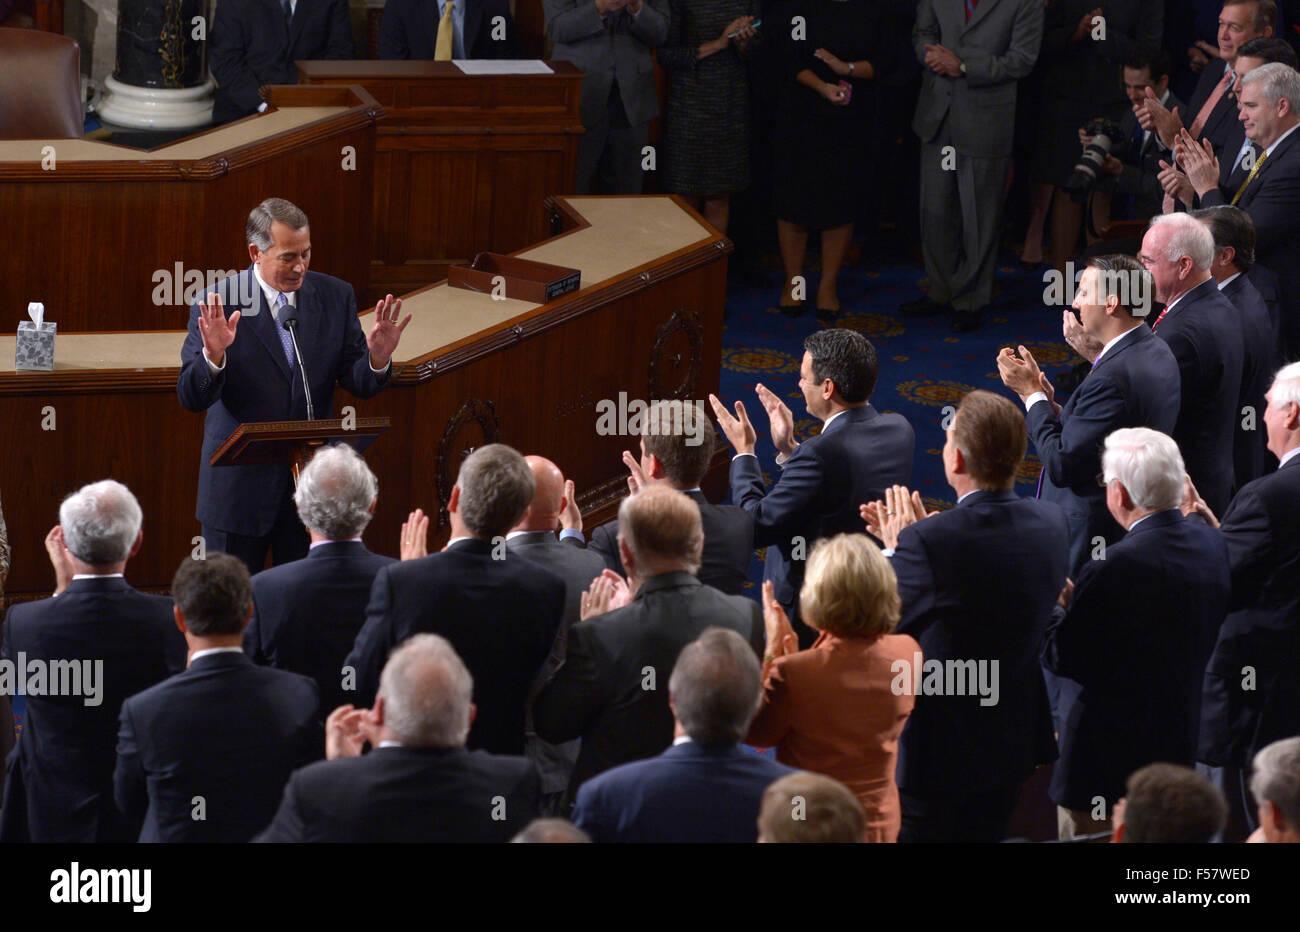 John Boehner Stock Photos & John Boehner Stock Images - Alamy